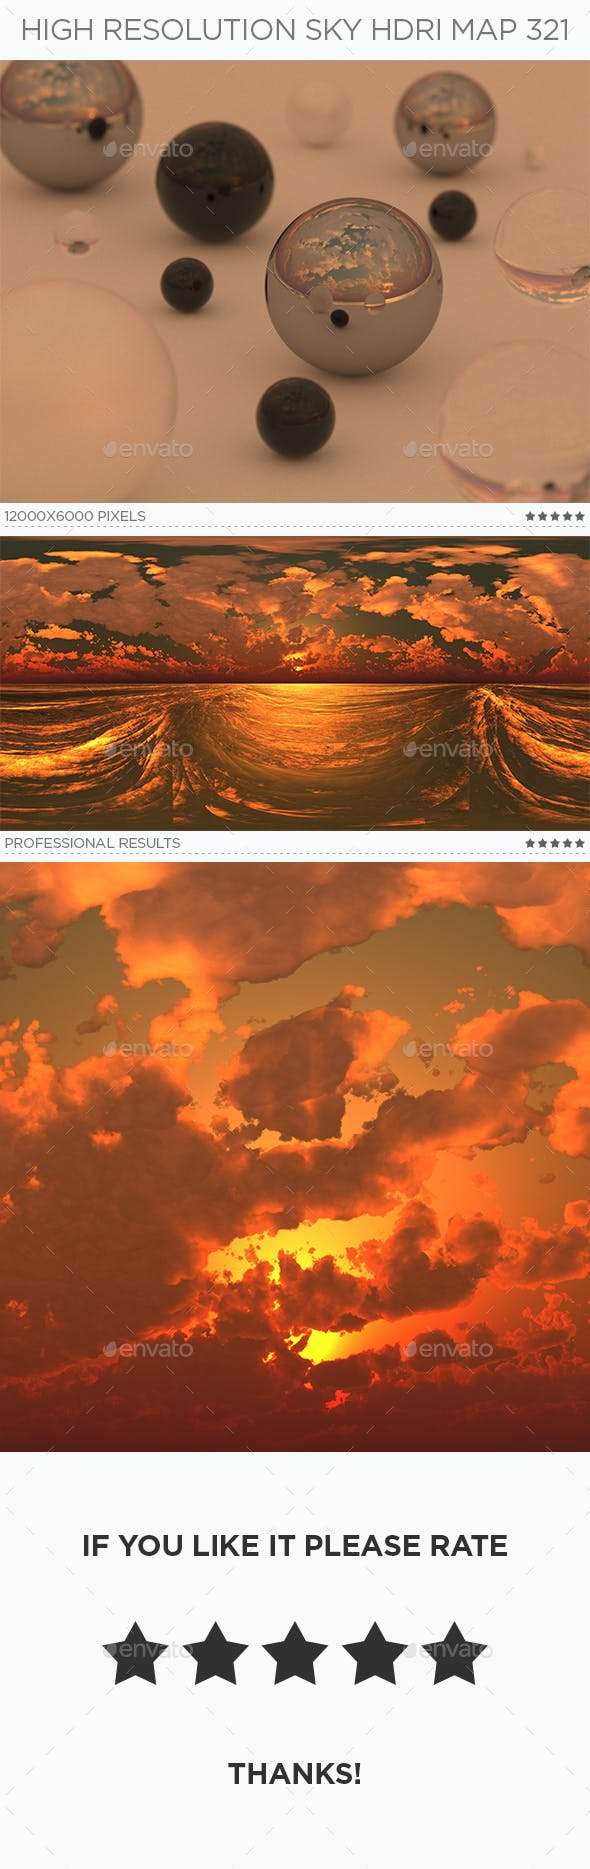 High Resolution Sky HDRi Map 321 - 3DOcean Item for Sale